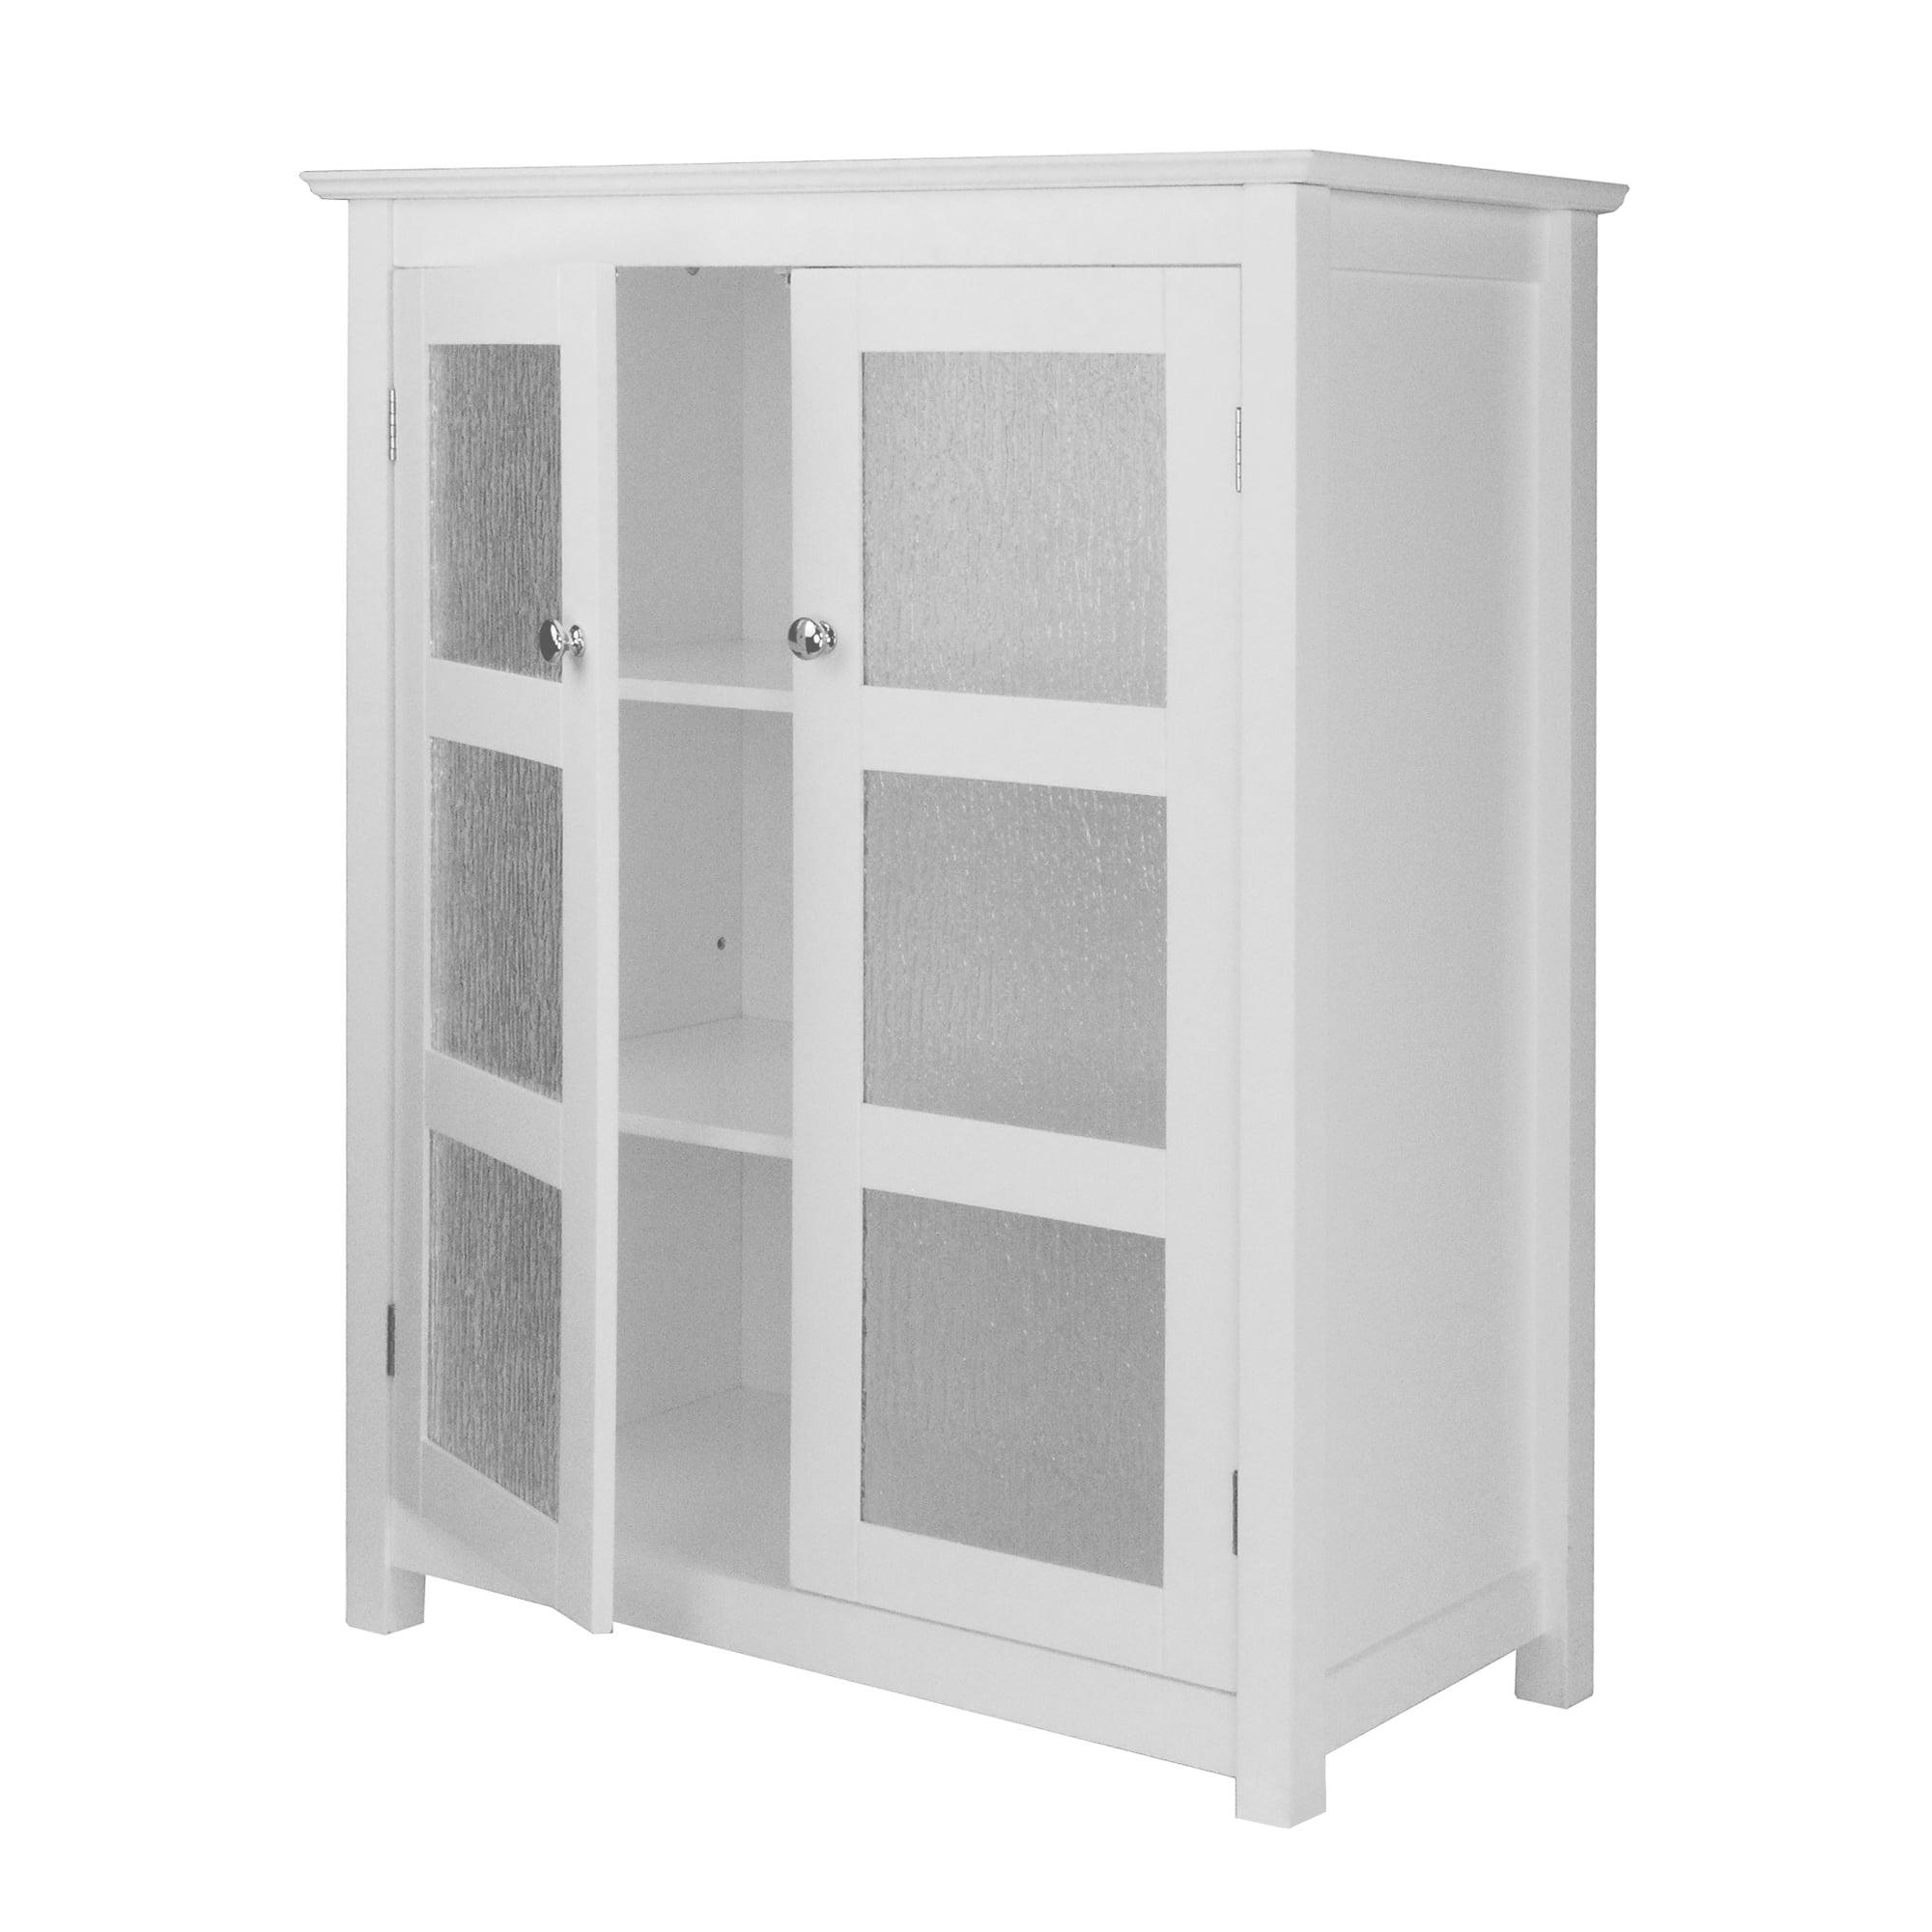 Connor Floor Cabinet With Glass Doors And Adjustable Shelves In White Walmart Com Walmart Com